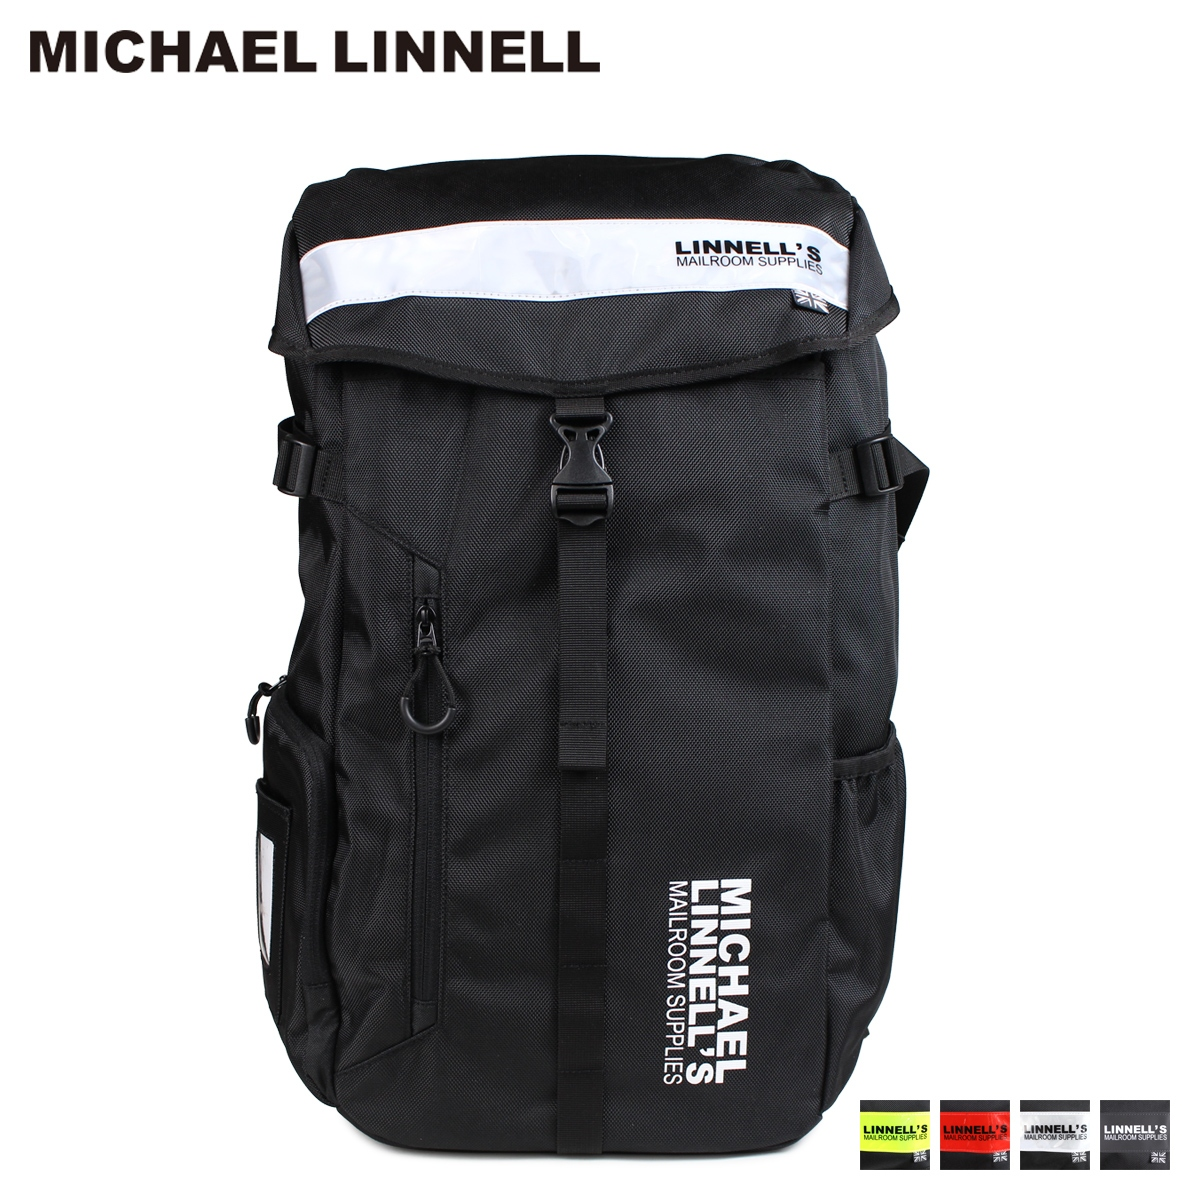 MICHAEL LINNELL マイケルリンネル リュック バッグ 30L メンズ レディース バックパック BIG BACKPACK ML-008